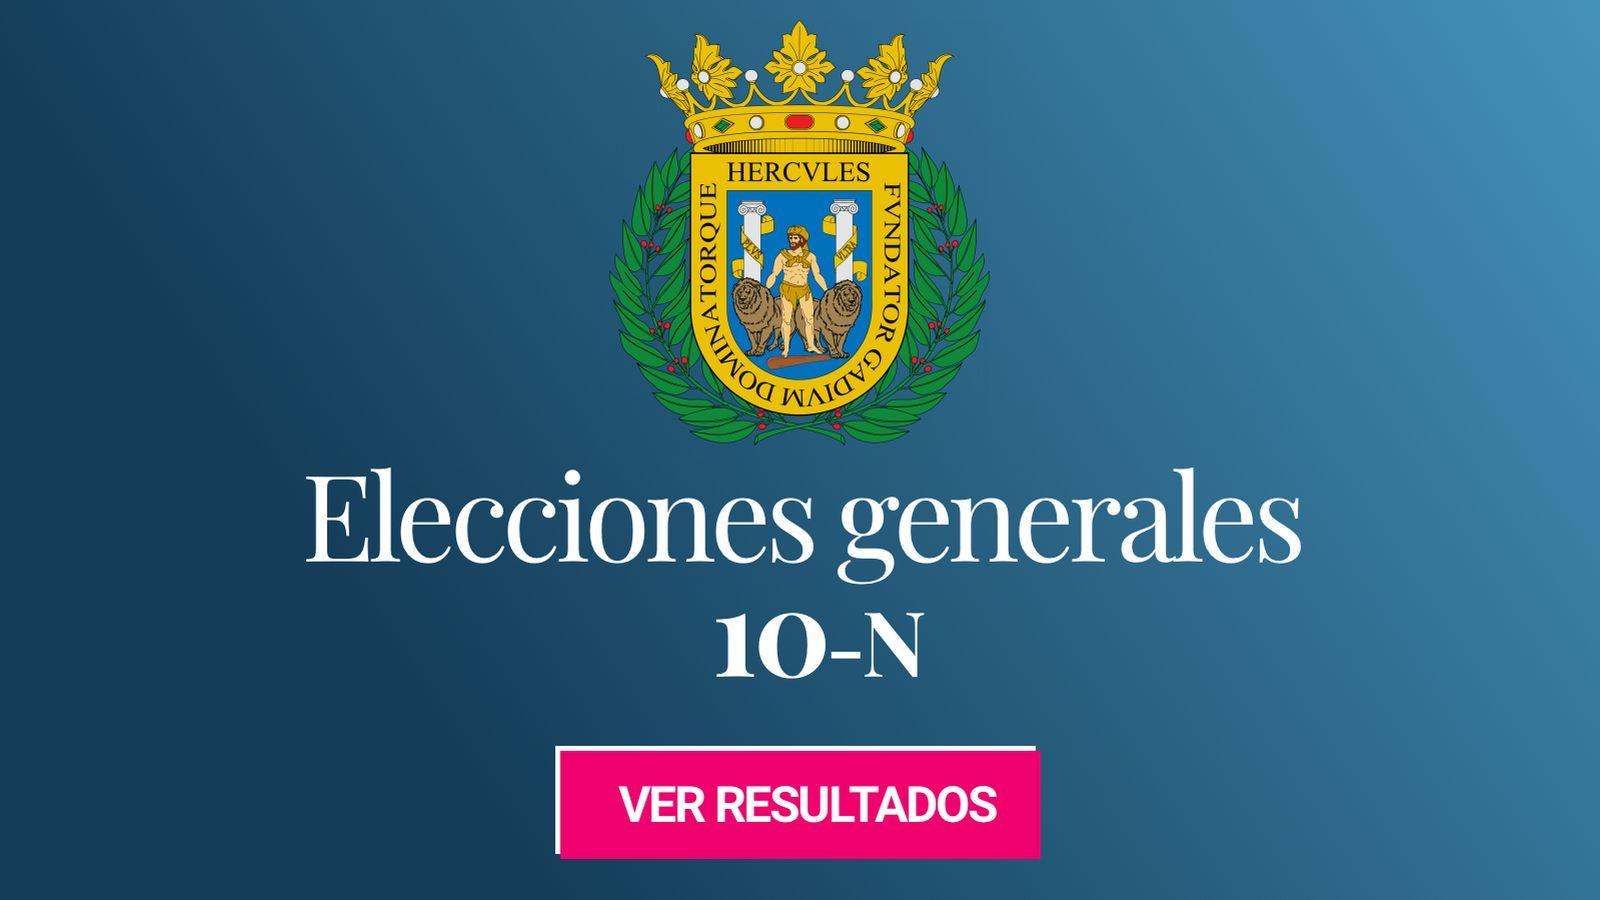 Foto: Elecciones generales 2019 en Cádiz. (C.C./EC)